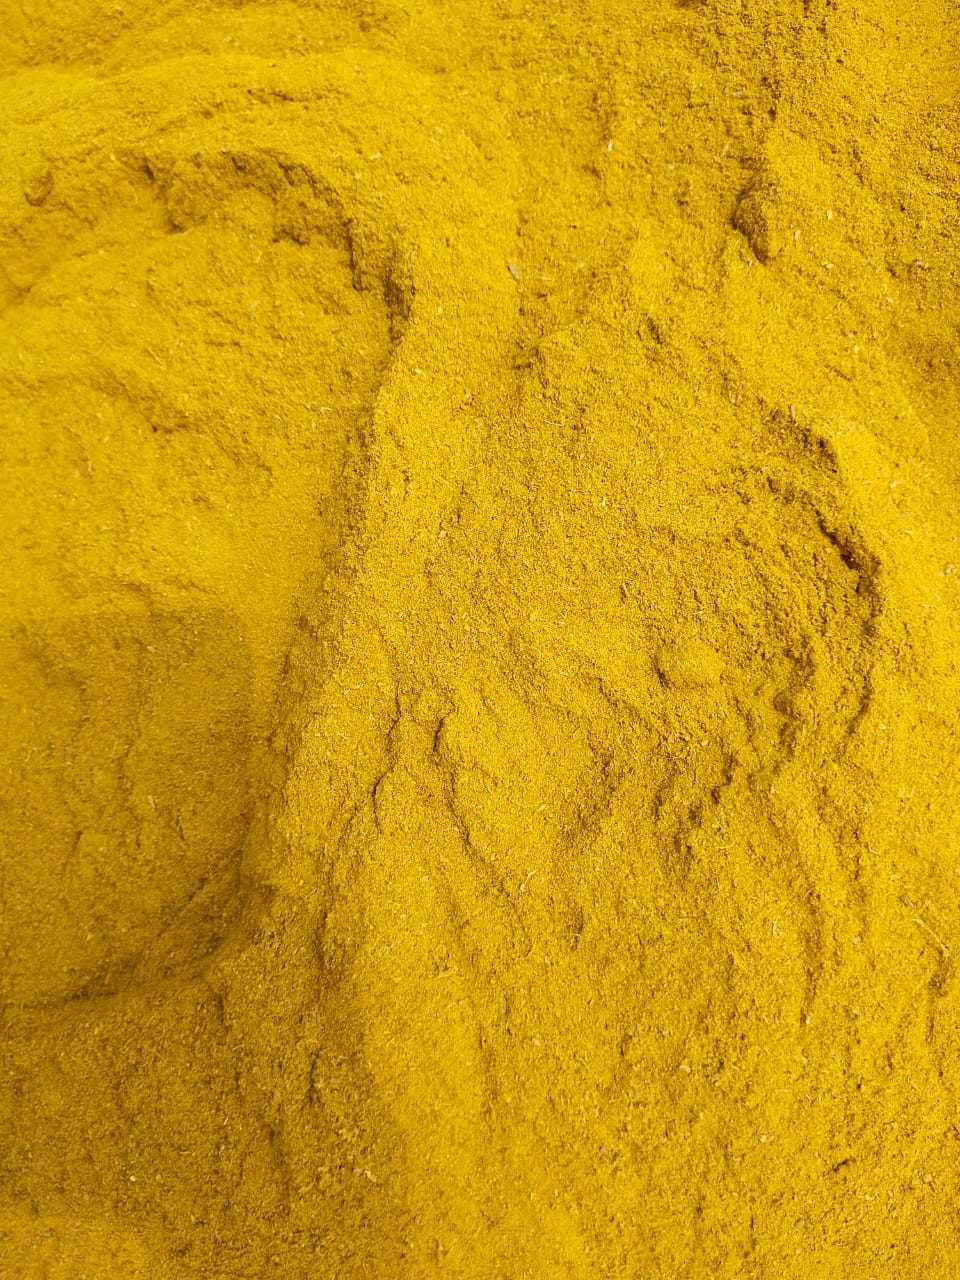 turmeric spent powder for animal use